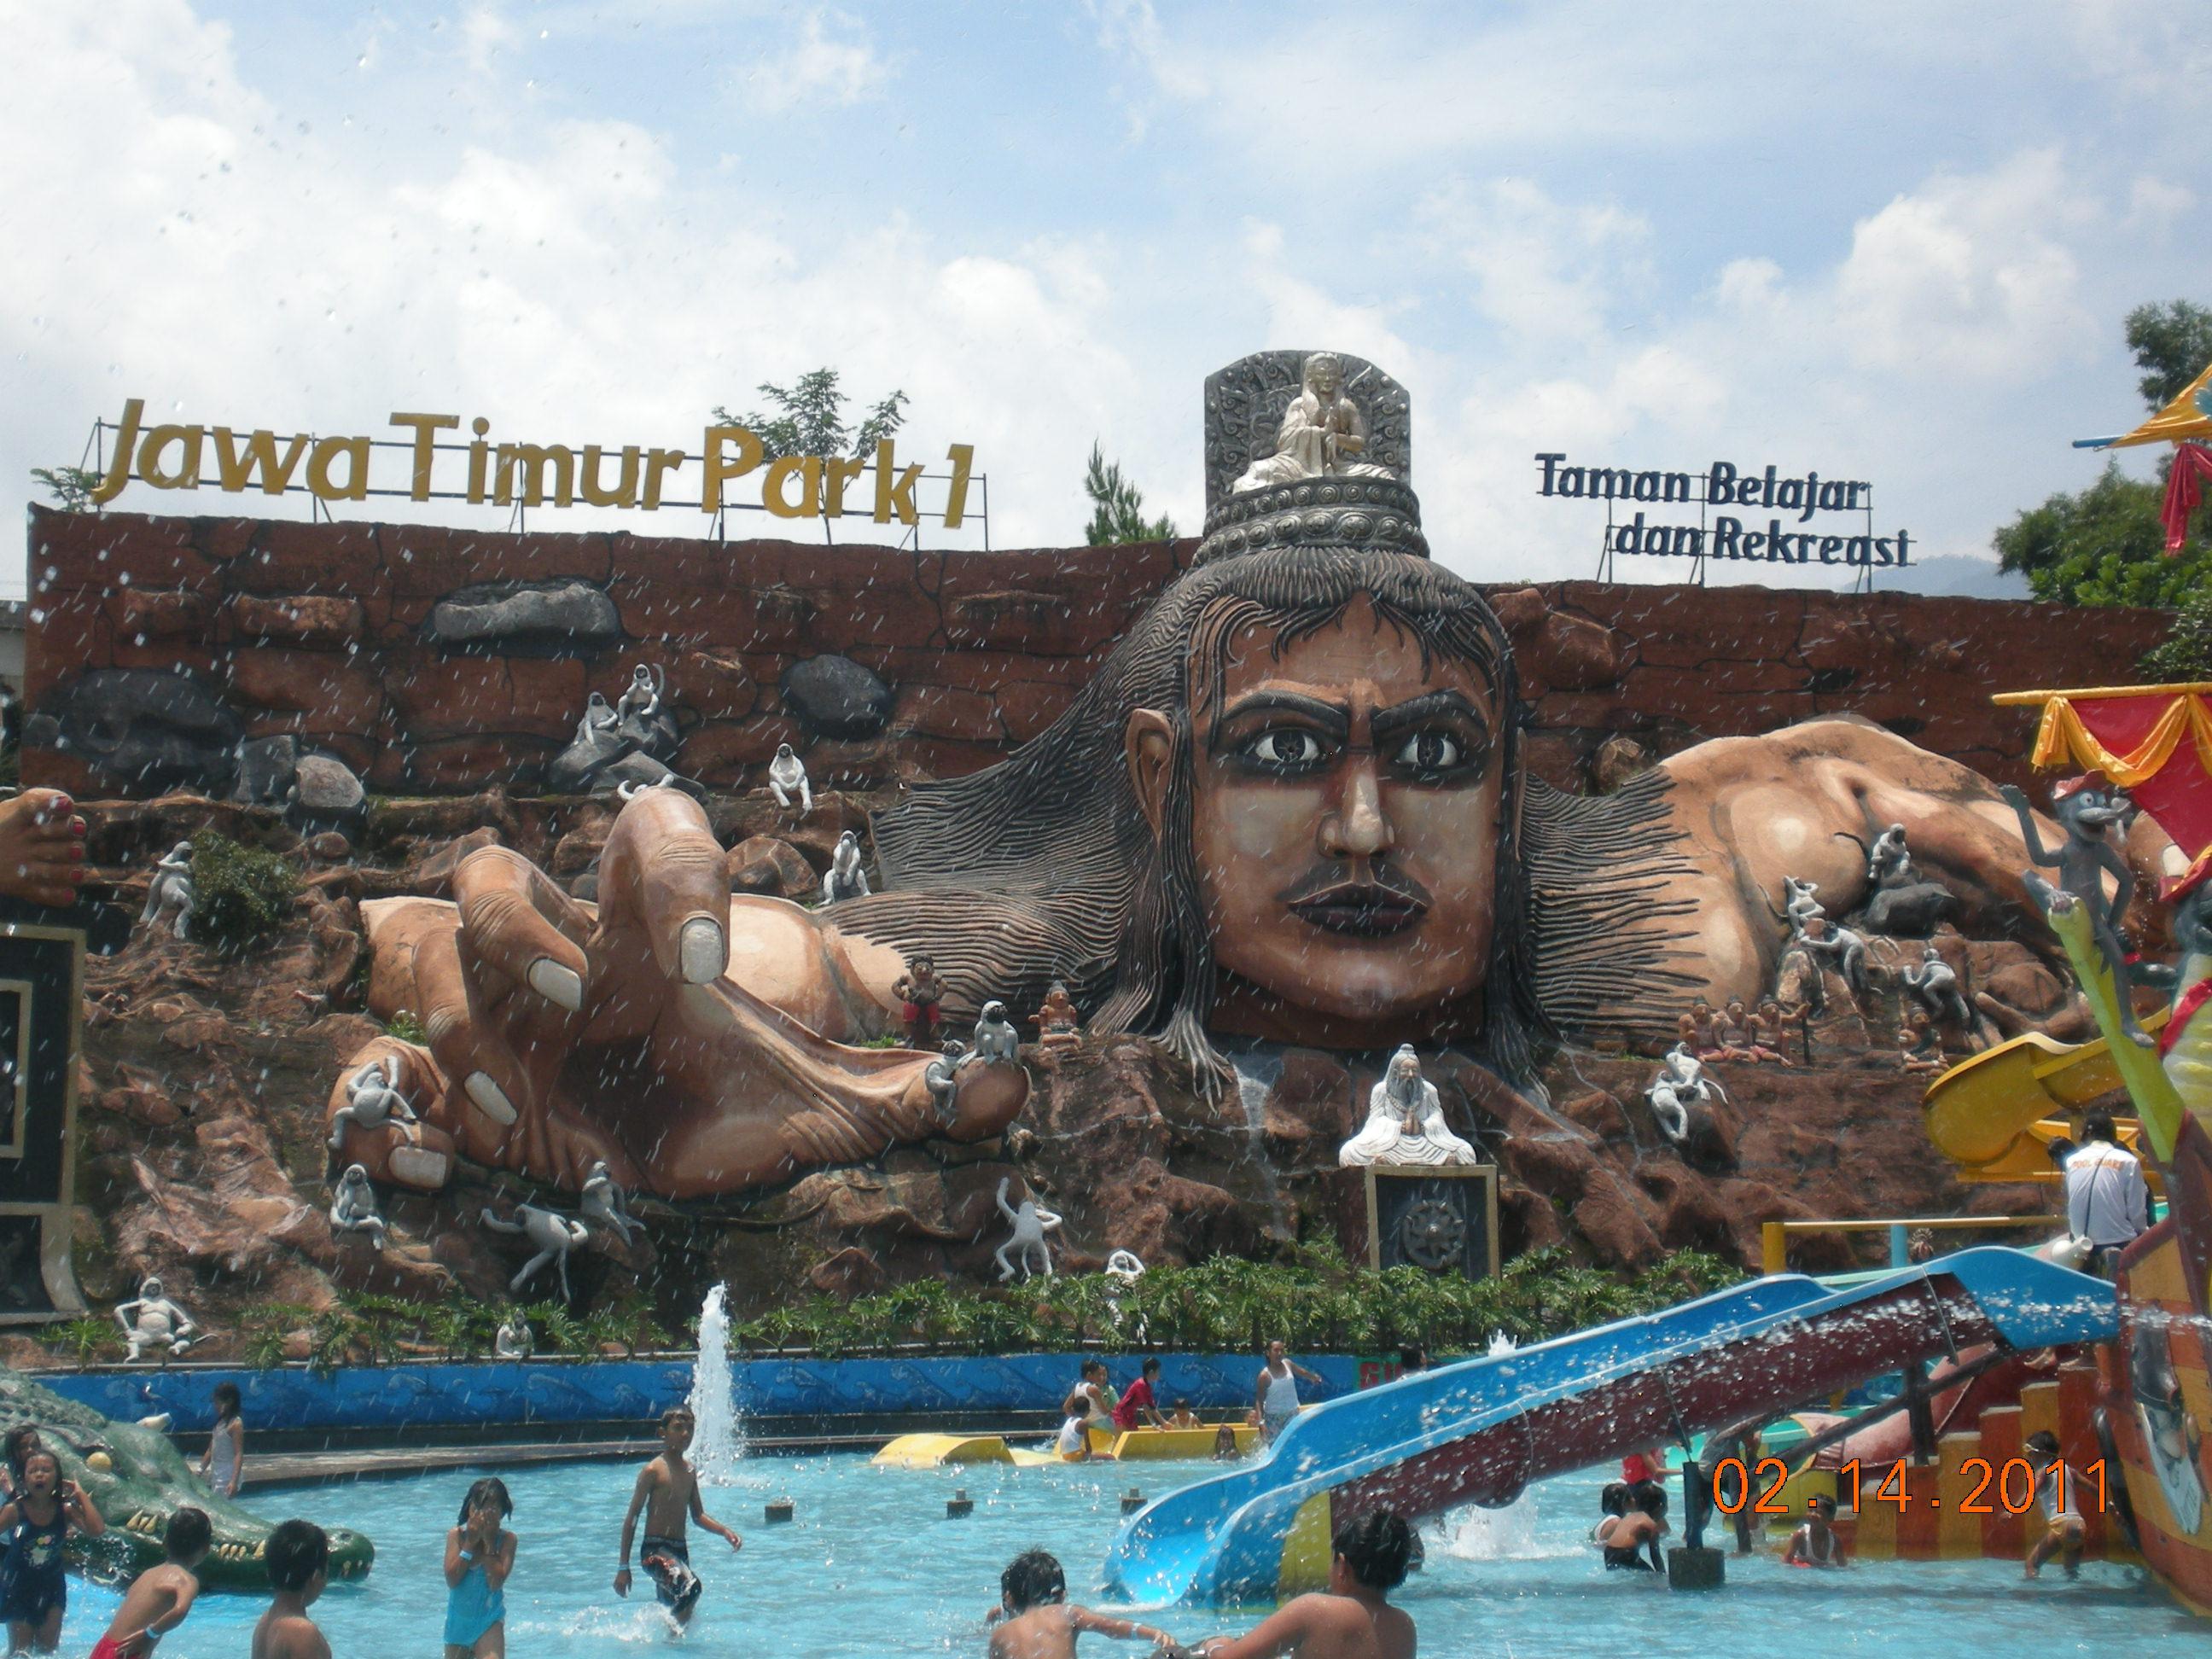 7 Tempat Wisata di Jawa Timur yang Wajib Dikunjungi